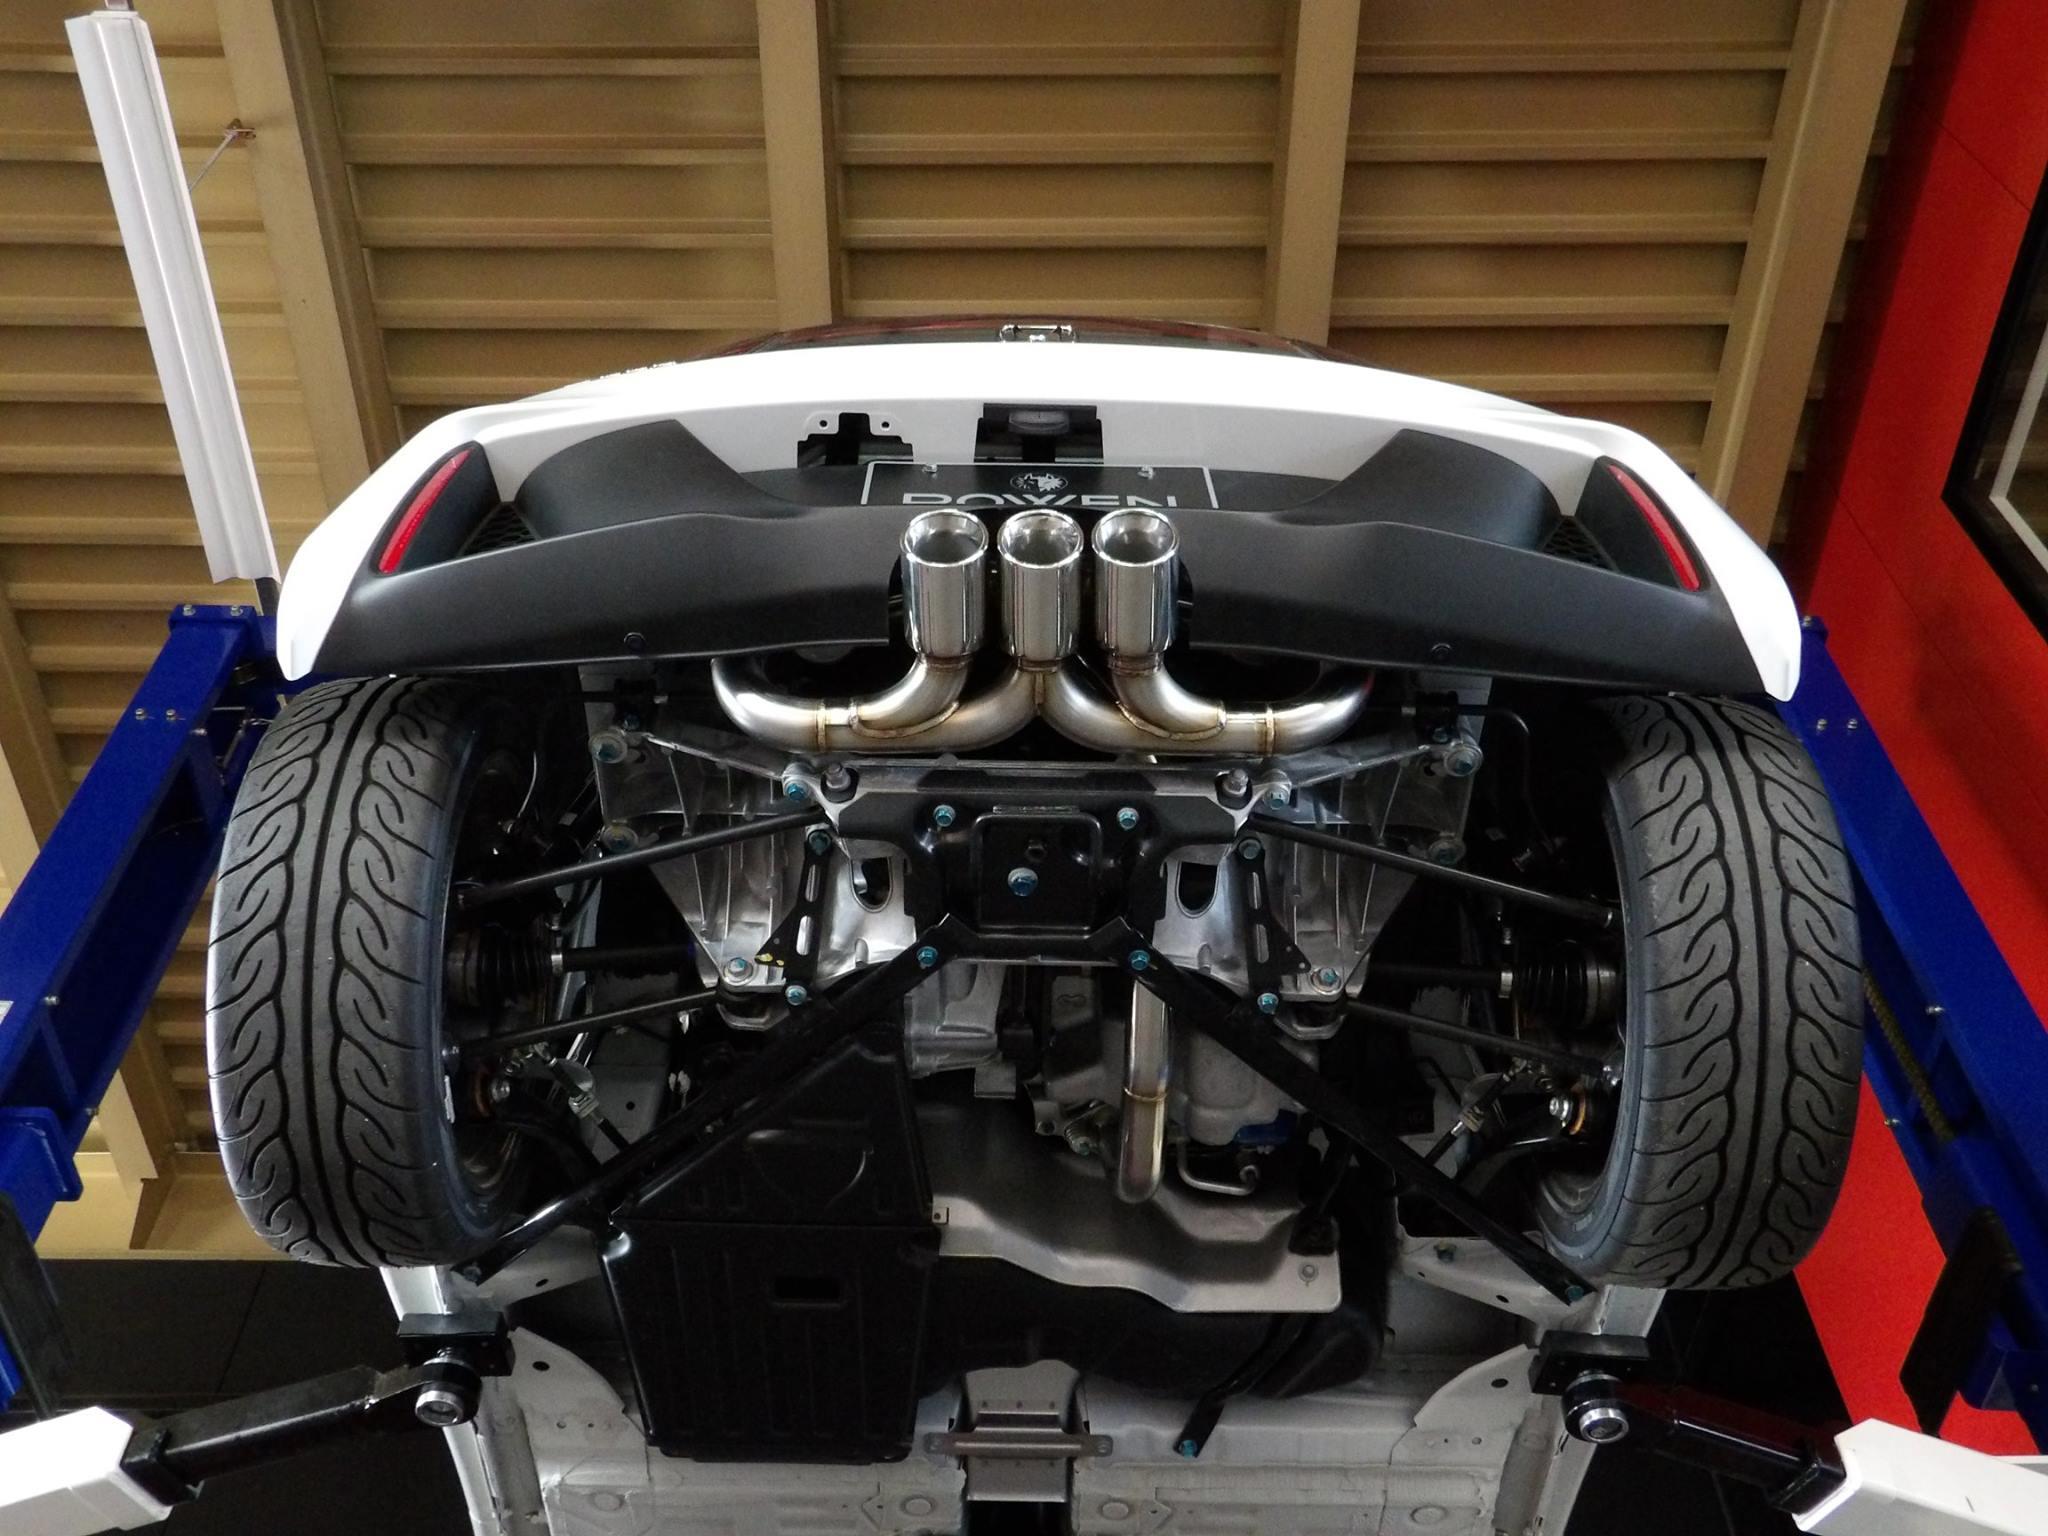 Honda S660 Copies Civic Type R Triple Exhaust In Rowen